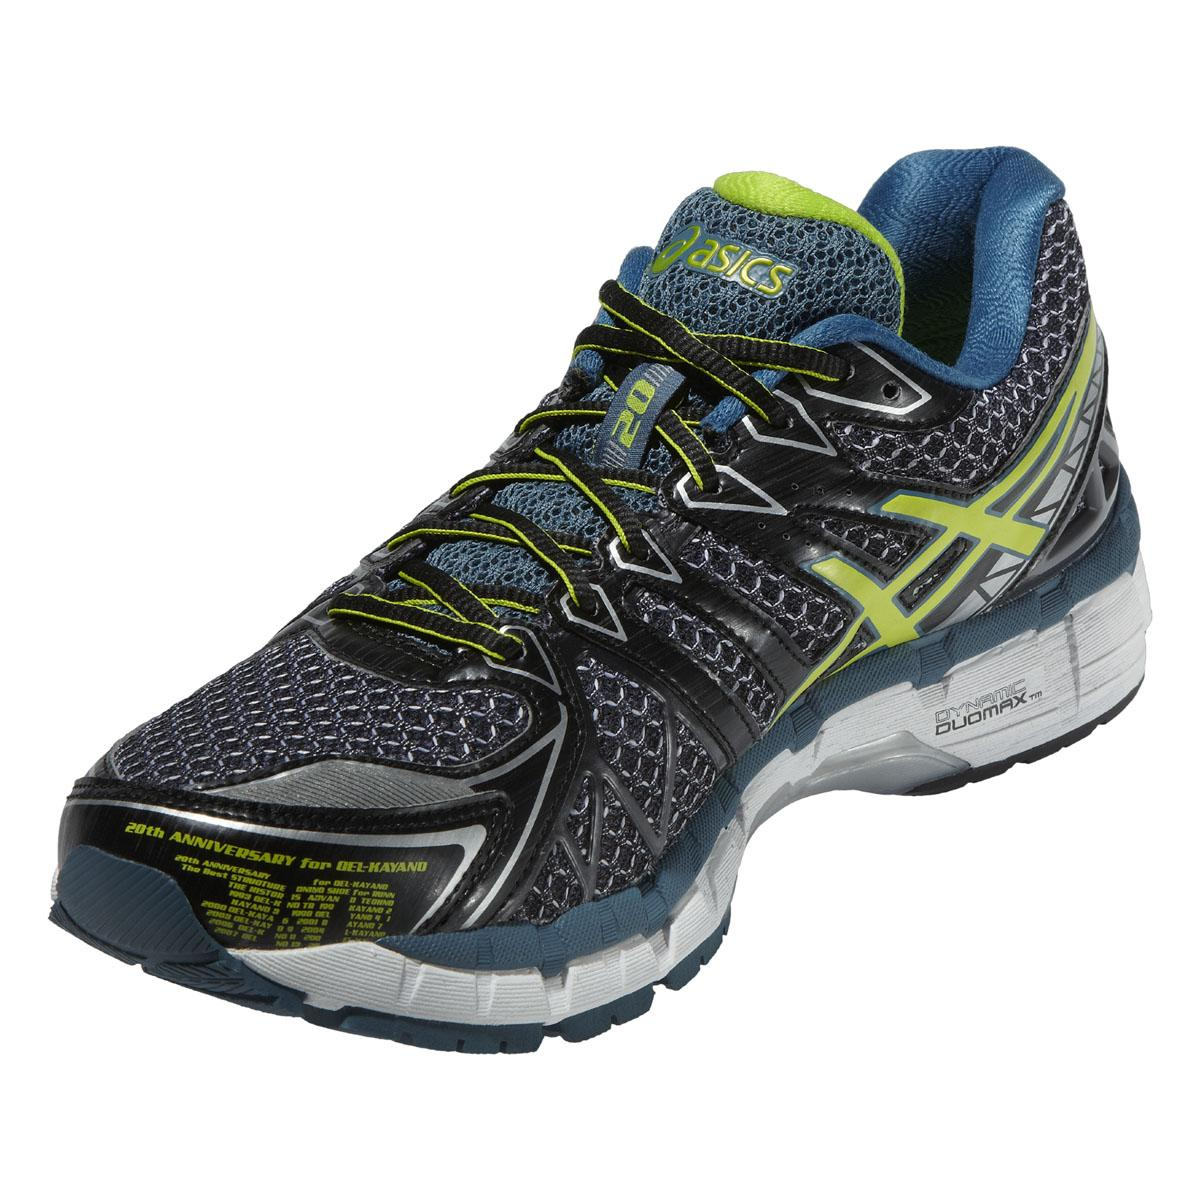 Black Asics Gel Running Shoes